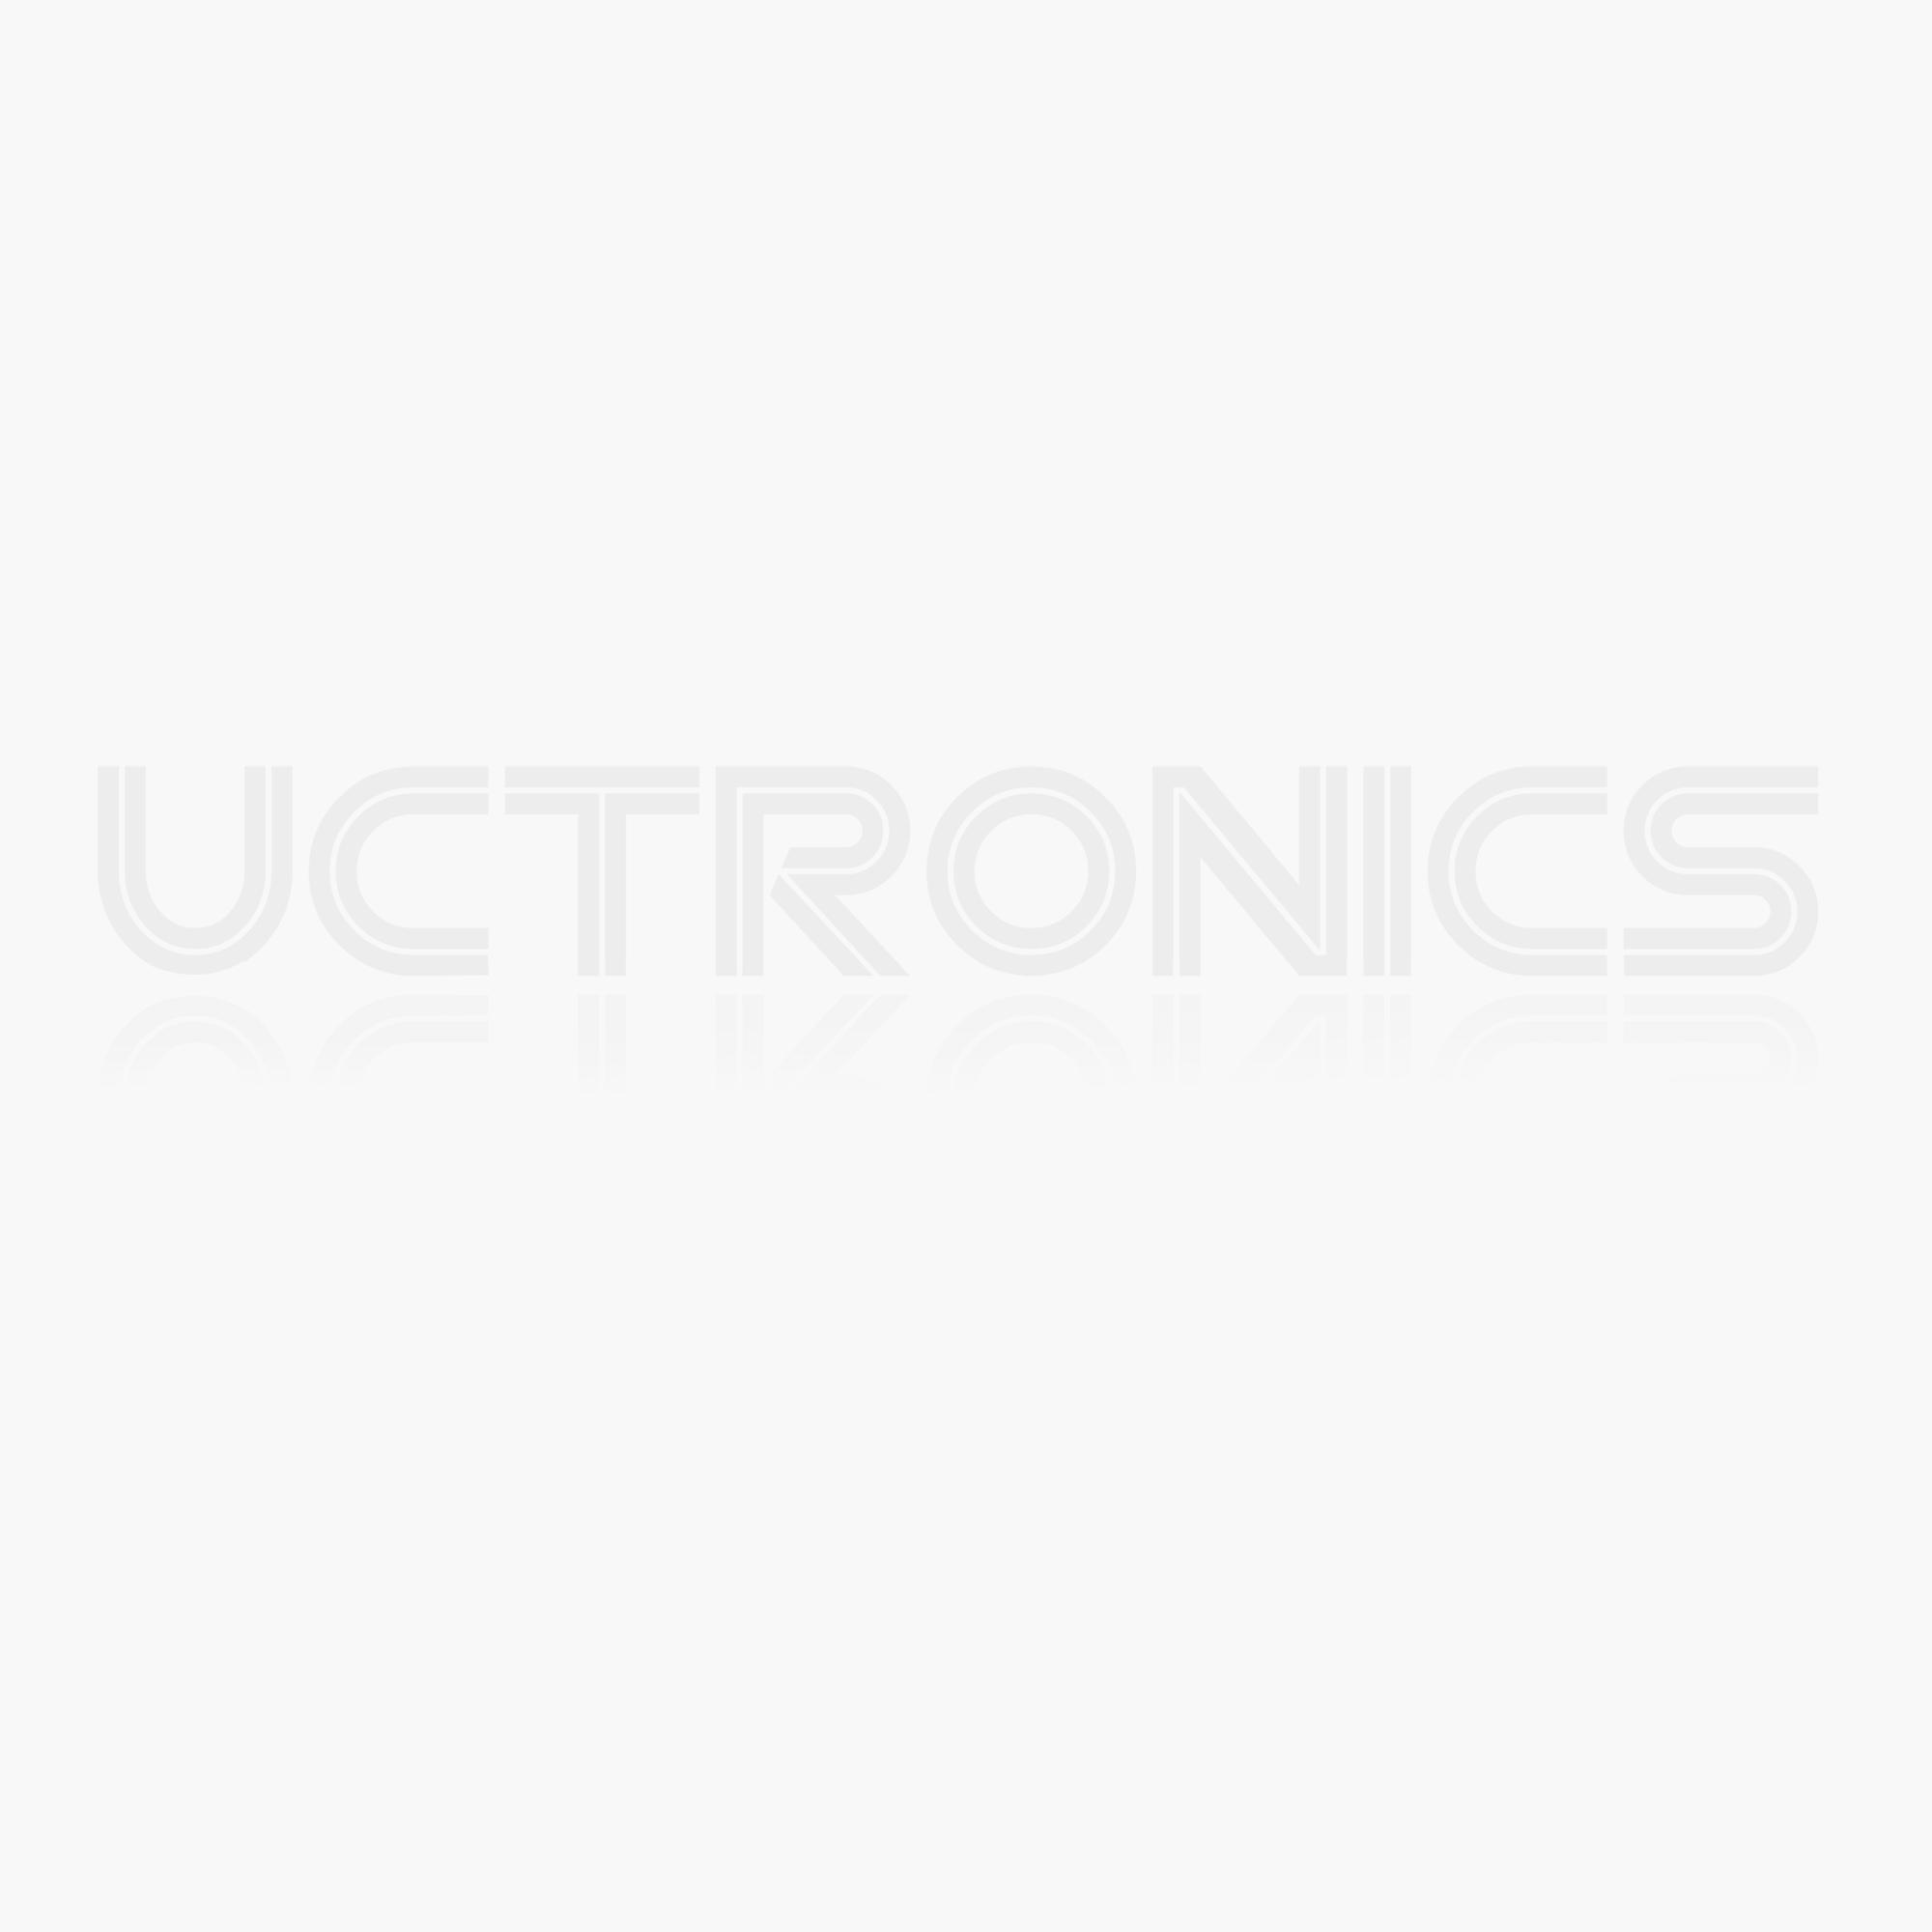 HC-12 SI4463 433M Wireless SCM serial Port module replace Bluetooth